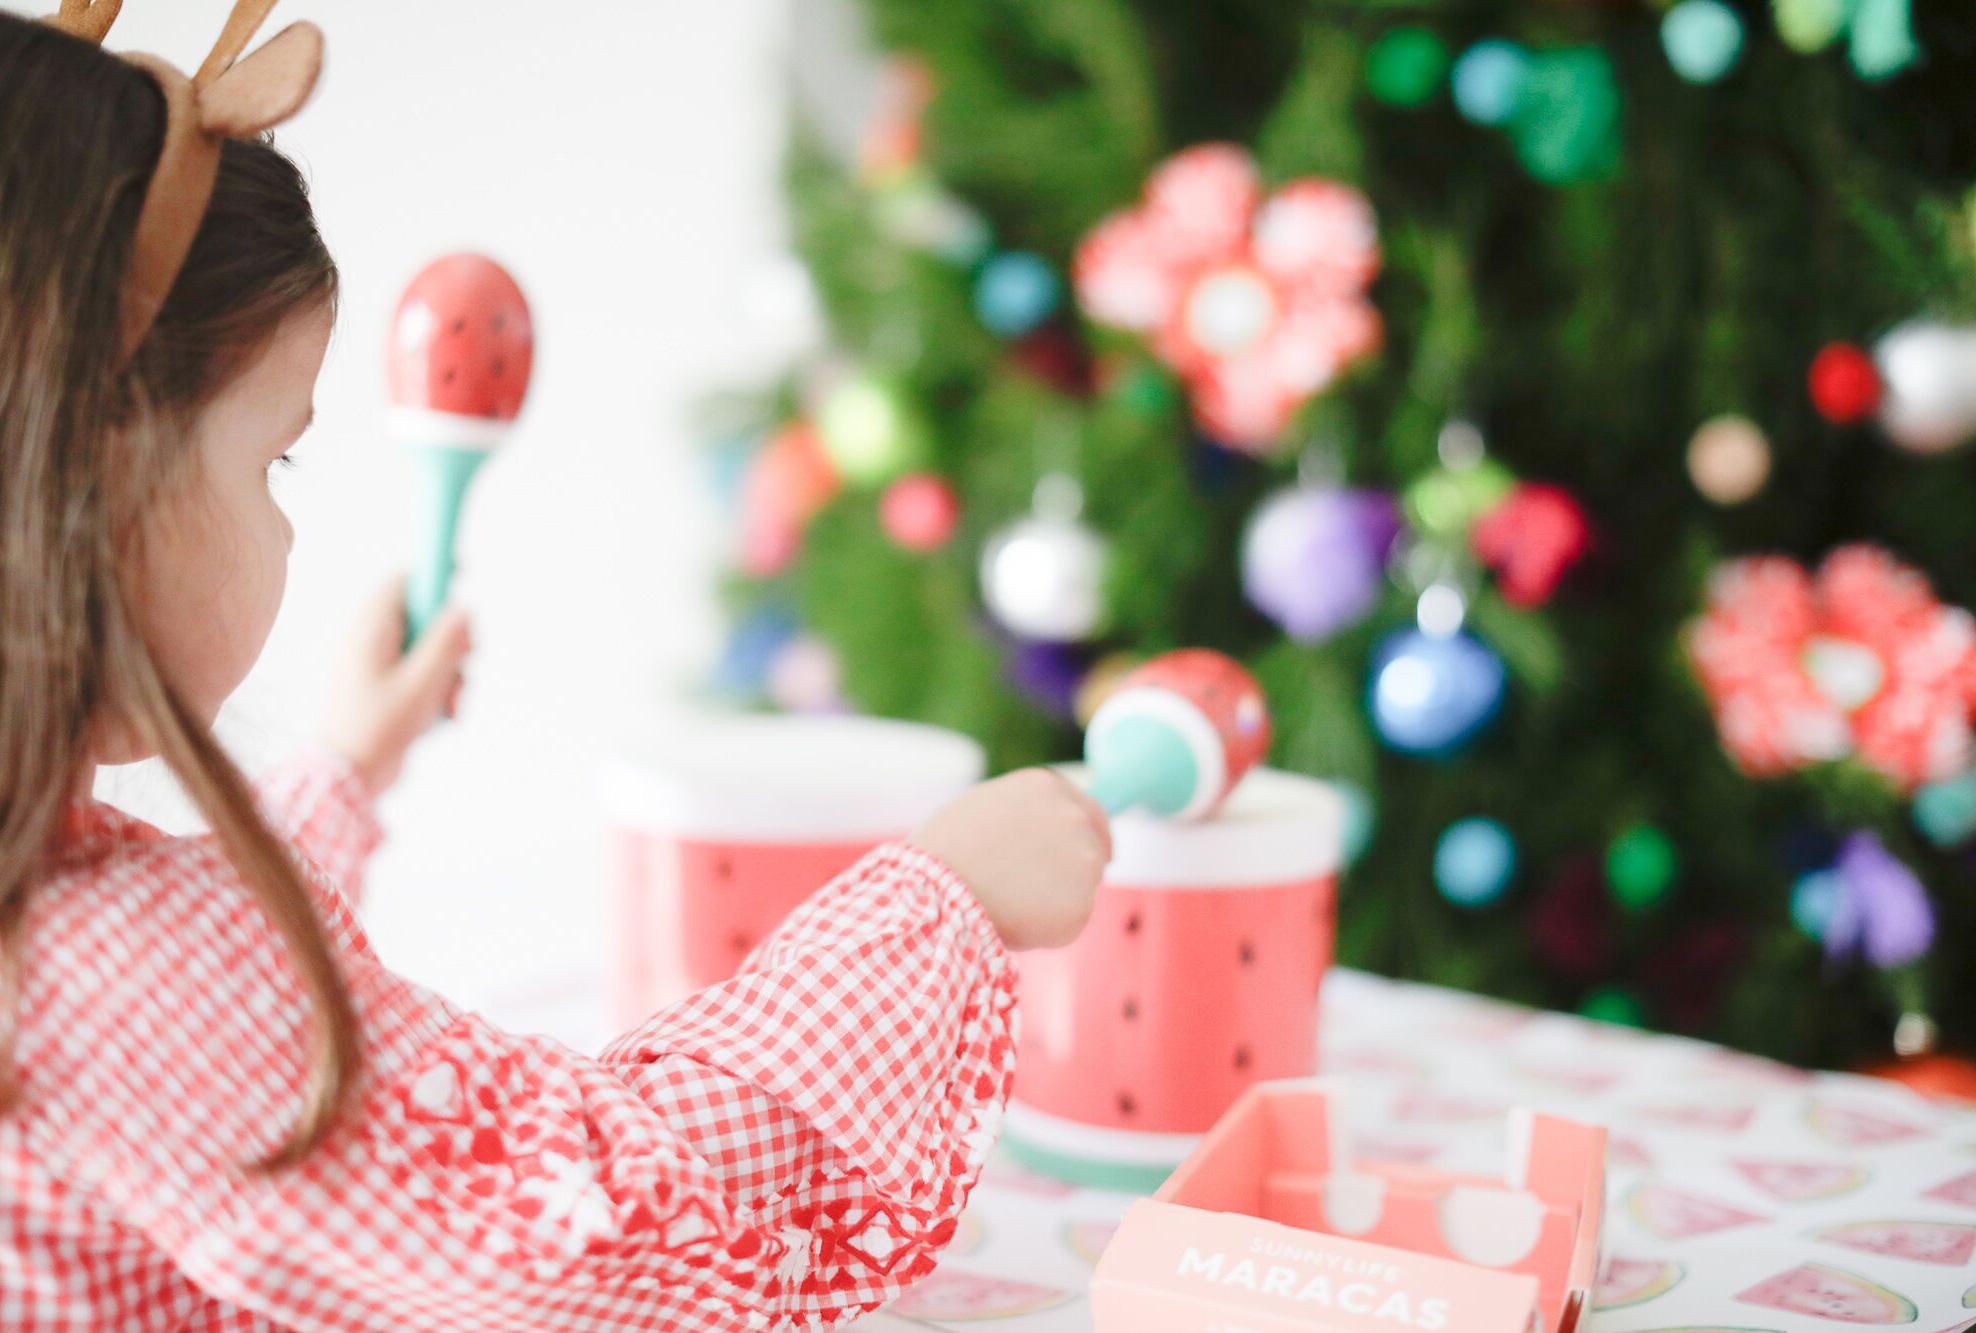 It's Tacky, OTT, A Consumer's Wonderland, But Here's Why Columnist Lauren Sams Loves Christmas Anyway